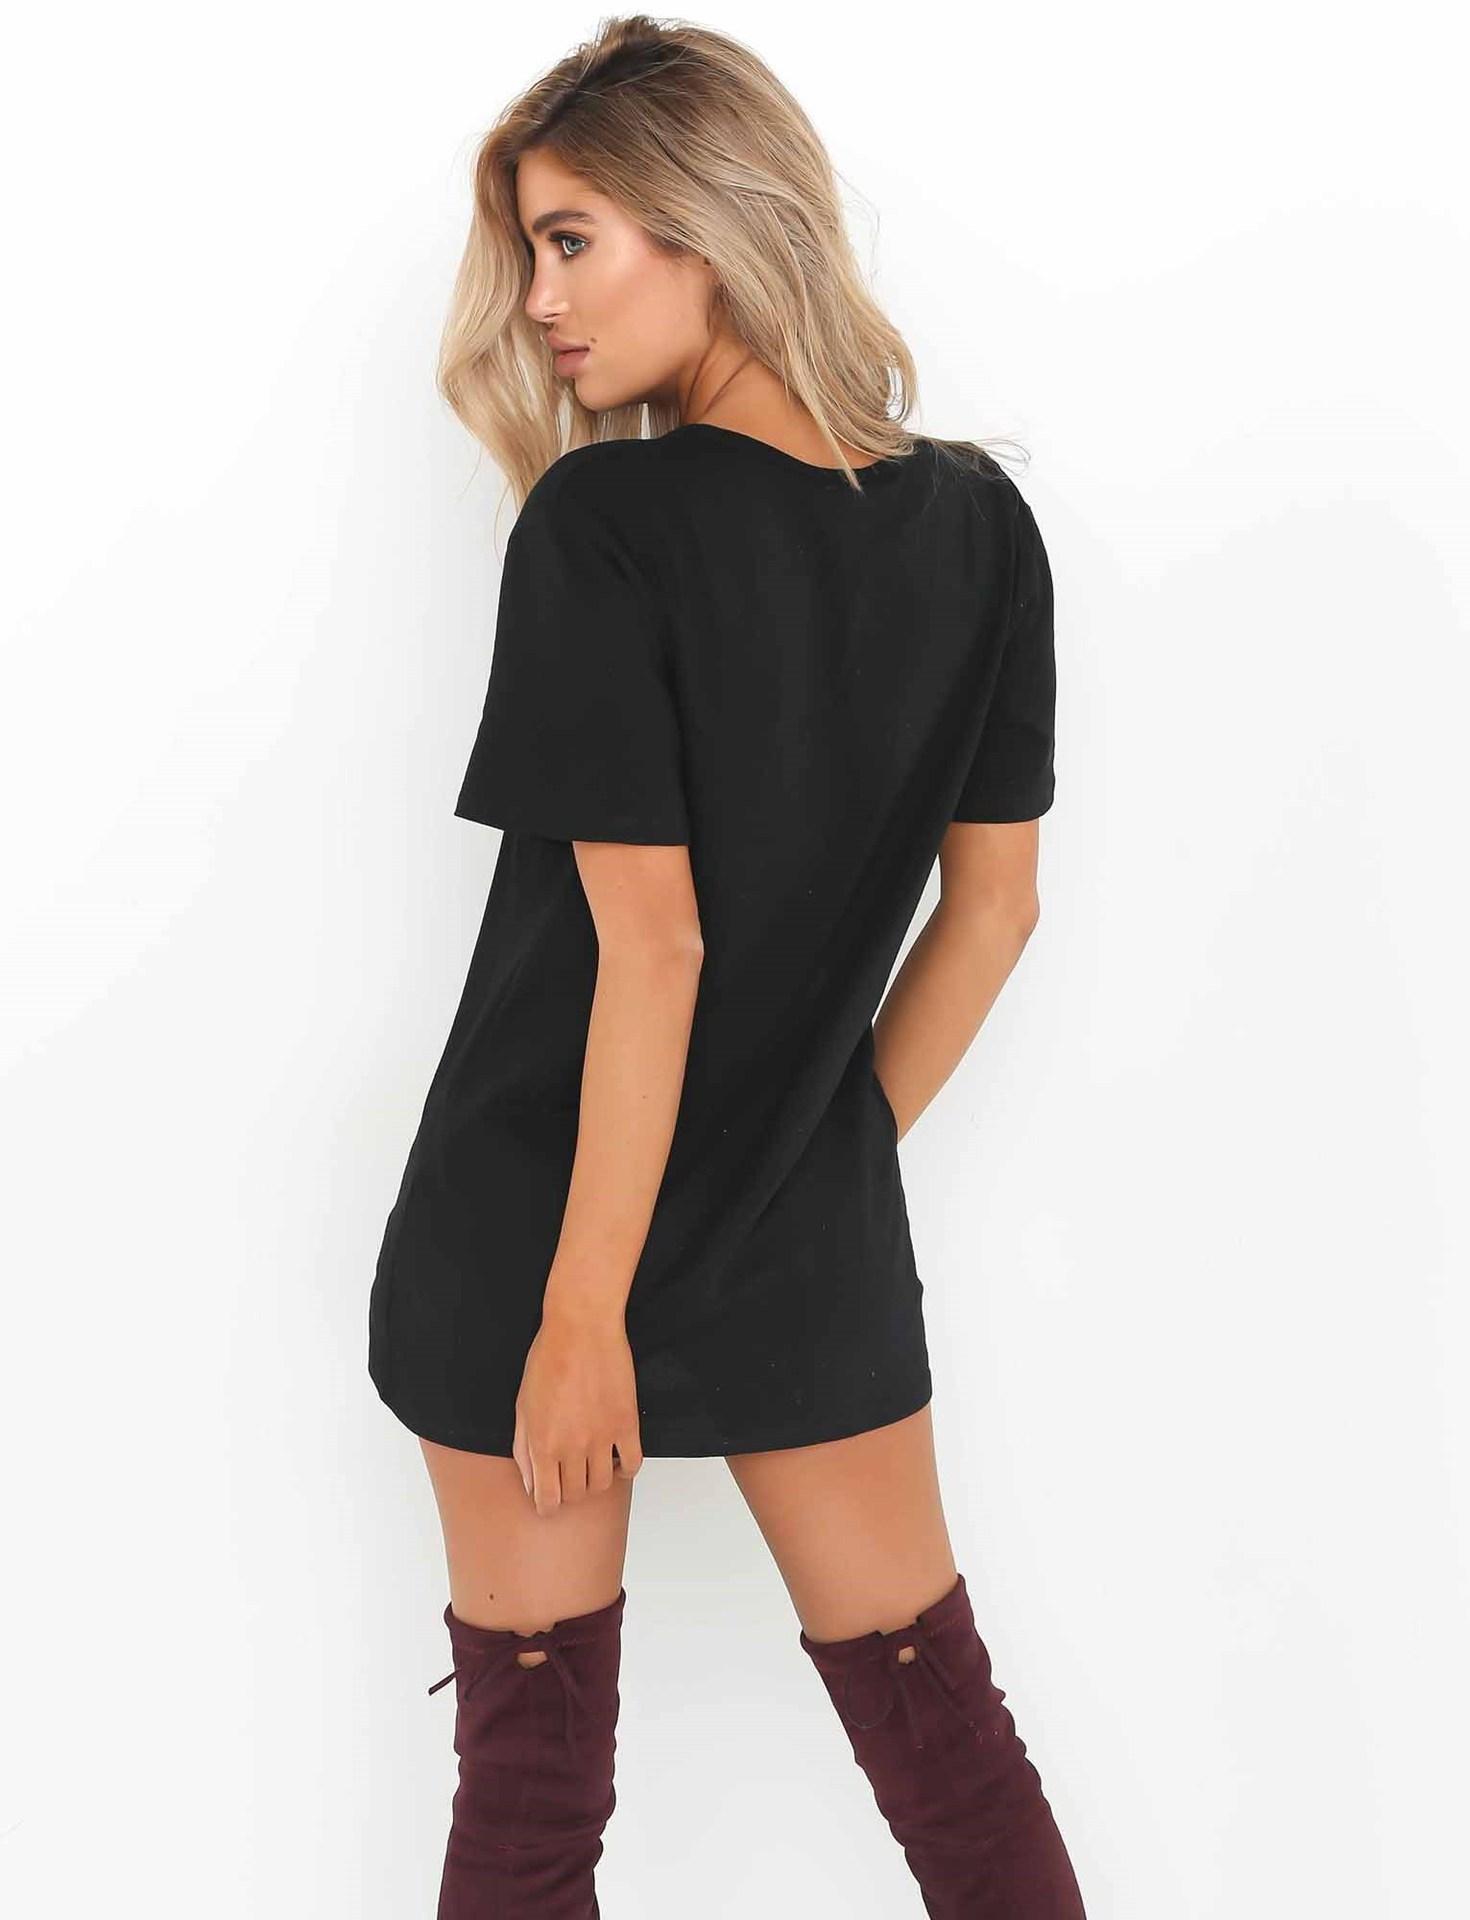 67b4b27e2 UK Womens Choker V Neck Long Top T-shirt Ladies Casual Party Mini Dress  Blouse